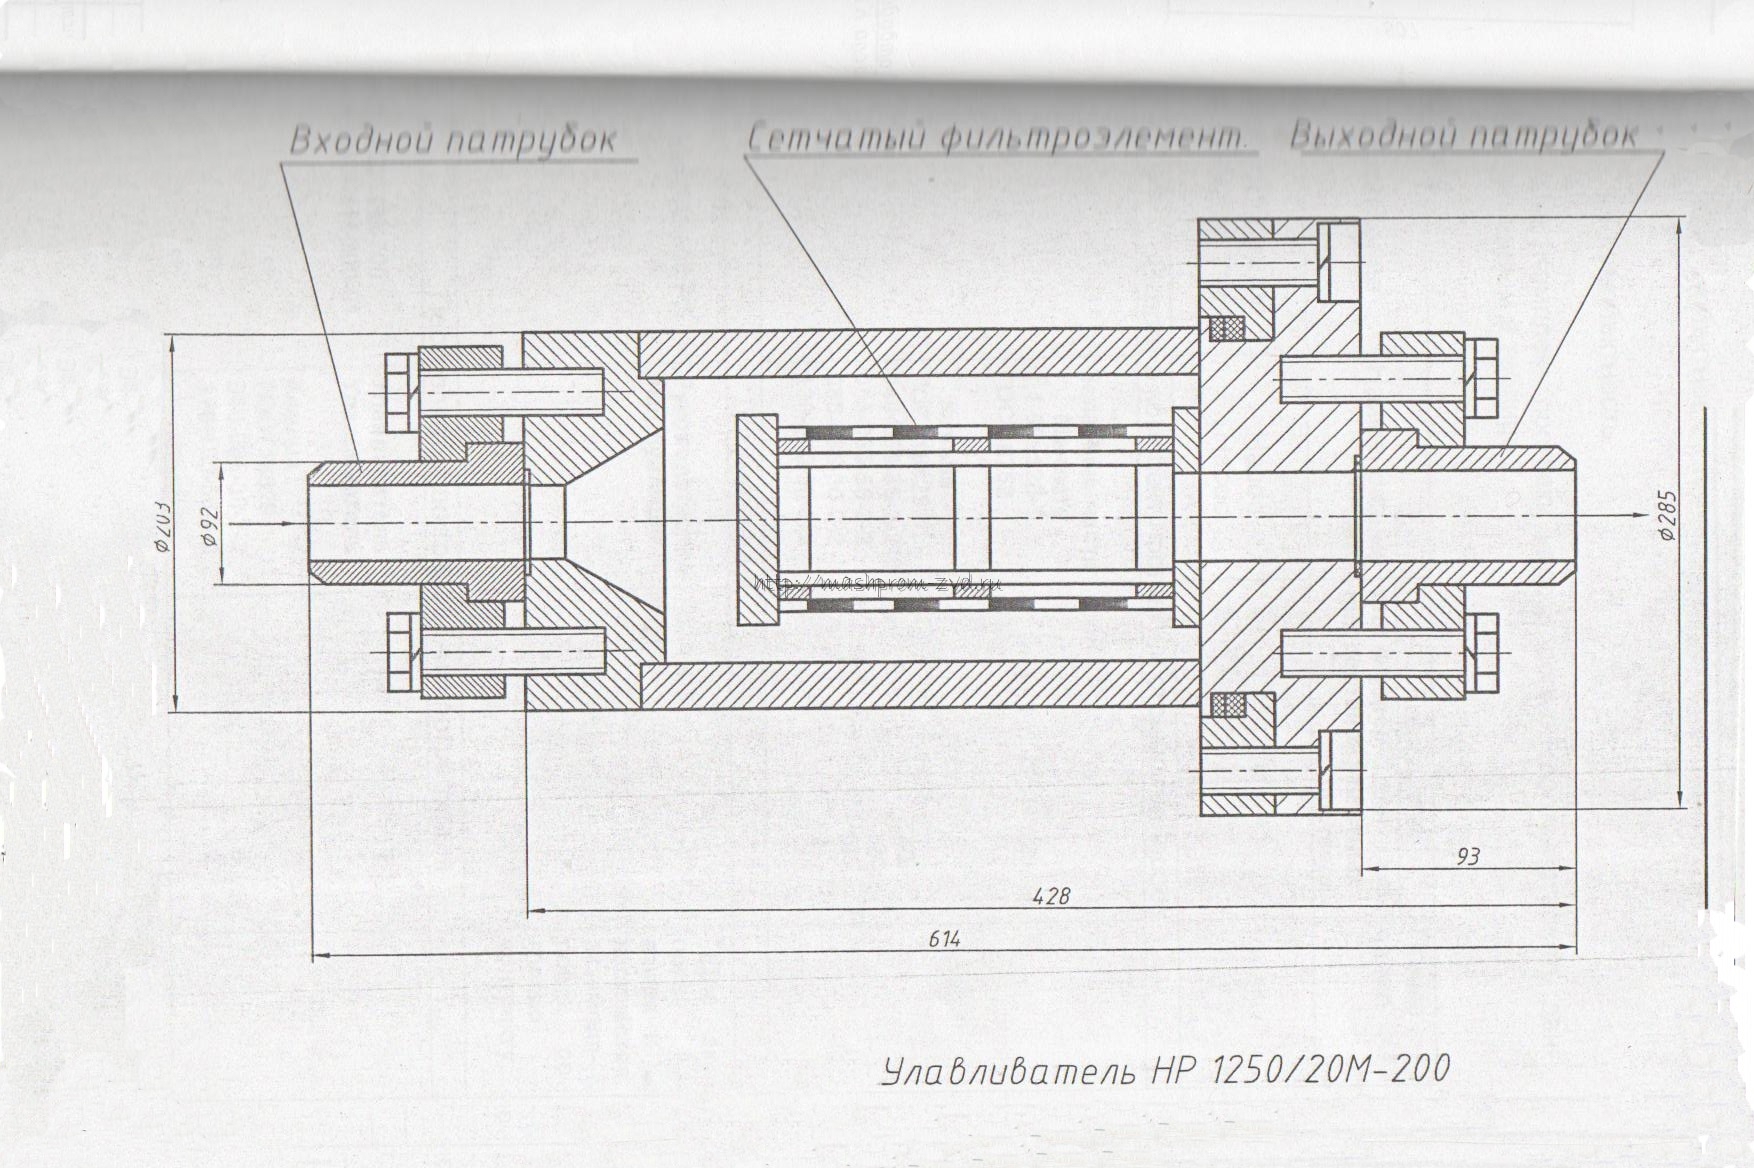 Улавливатель НР 1250/20М-200